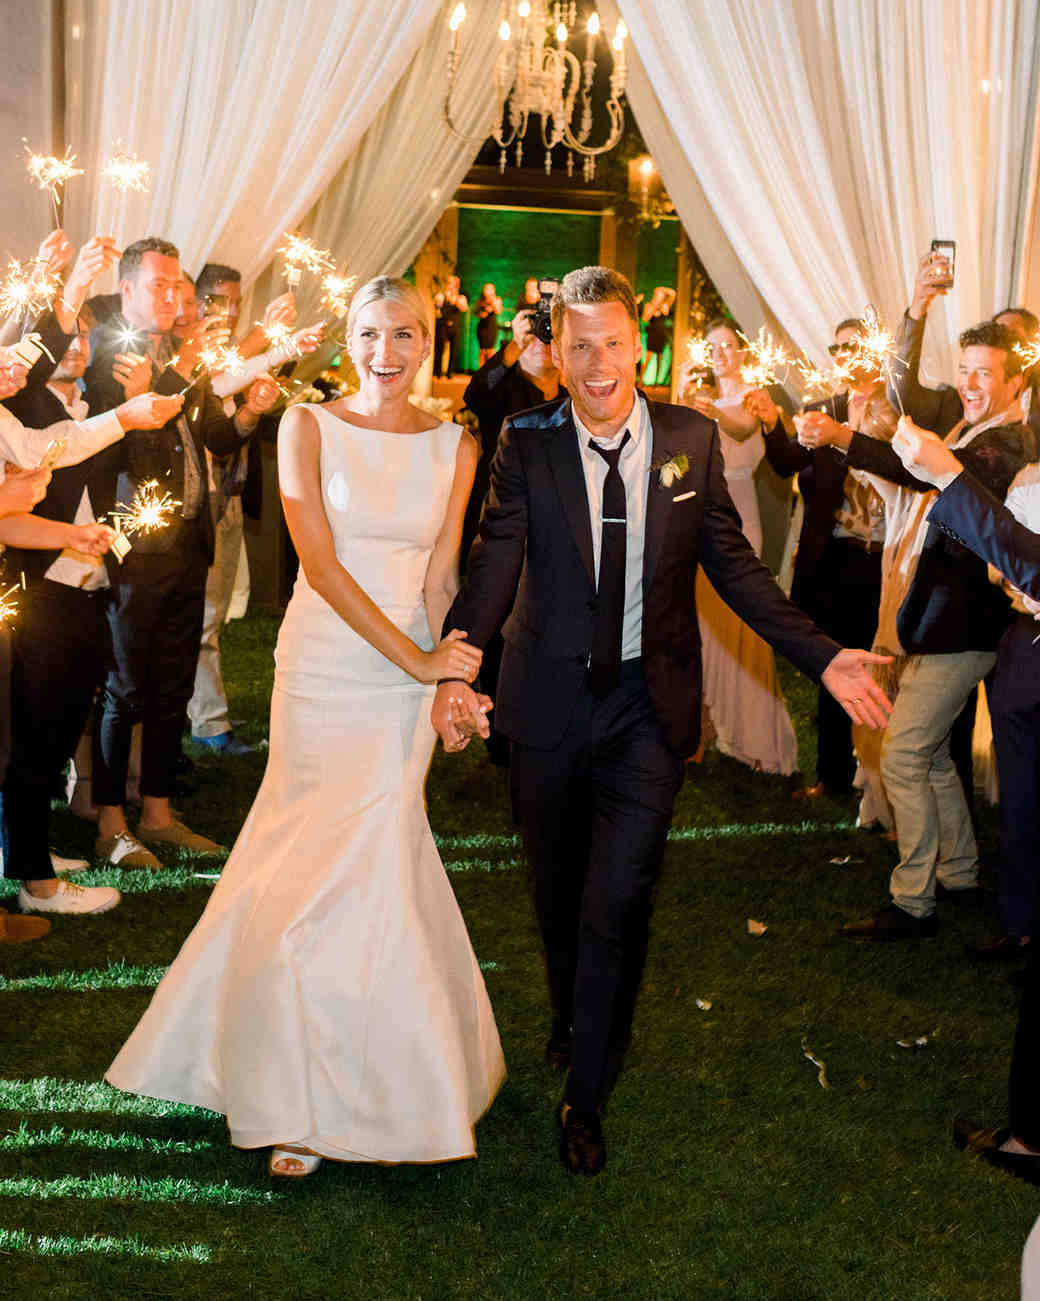 ashlie adam alpert wedding sparkler send off